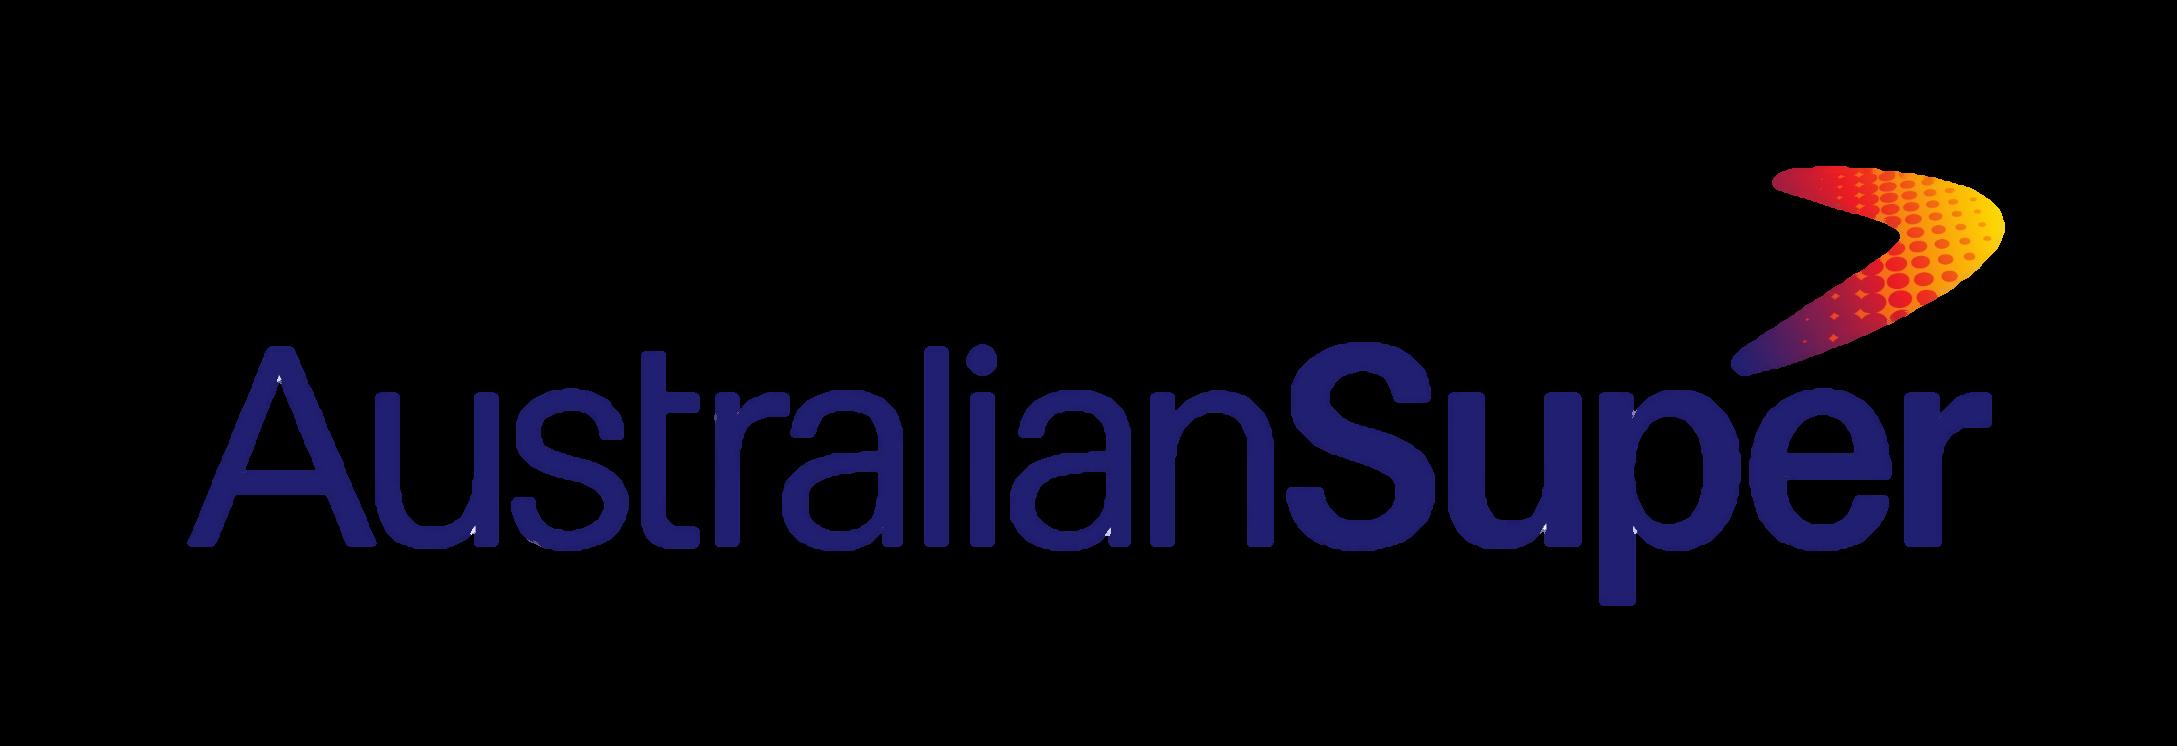 australian super.png